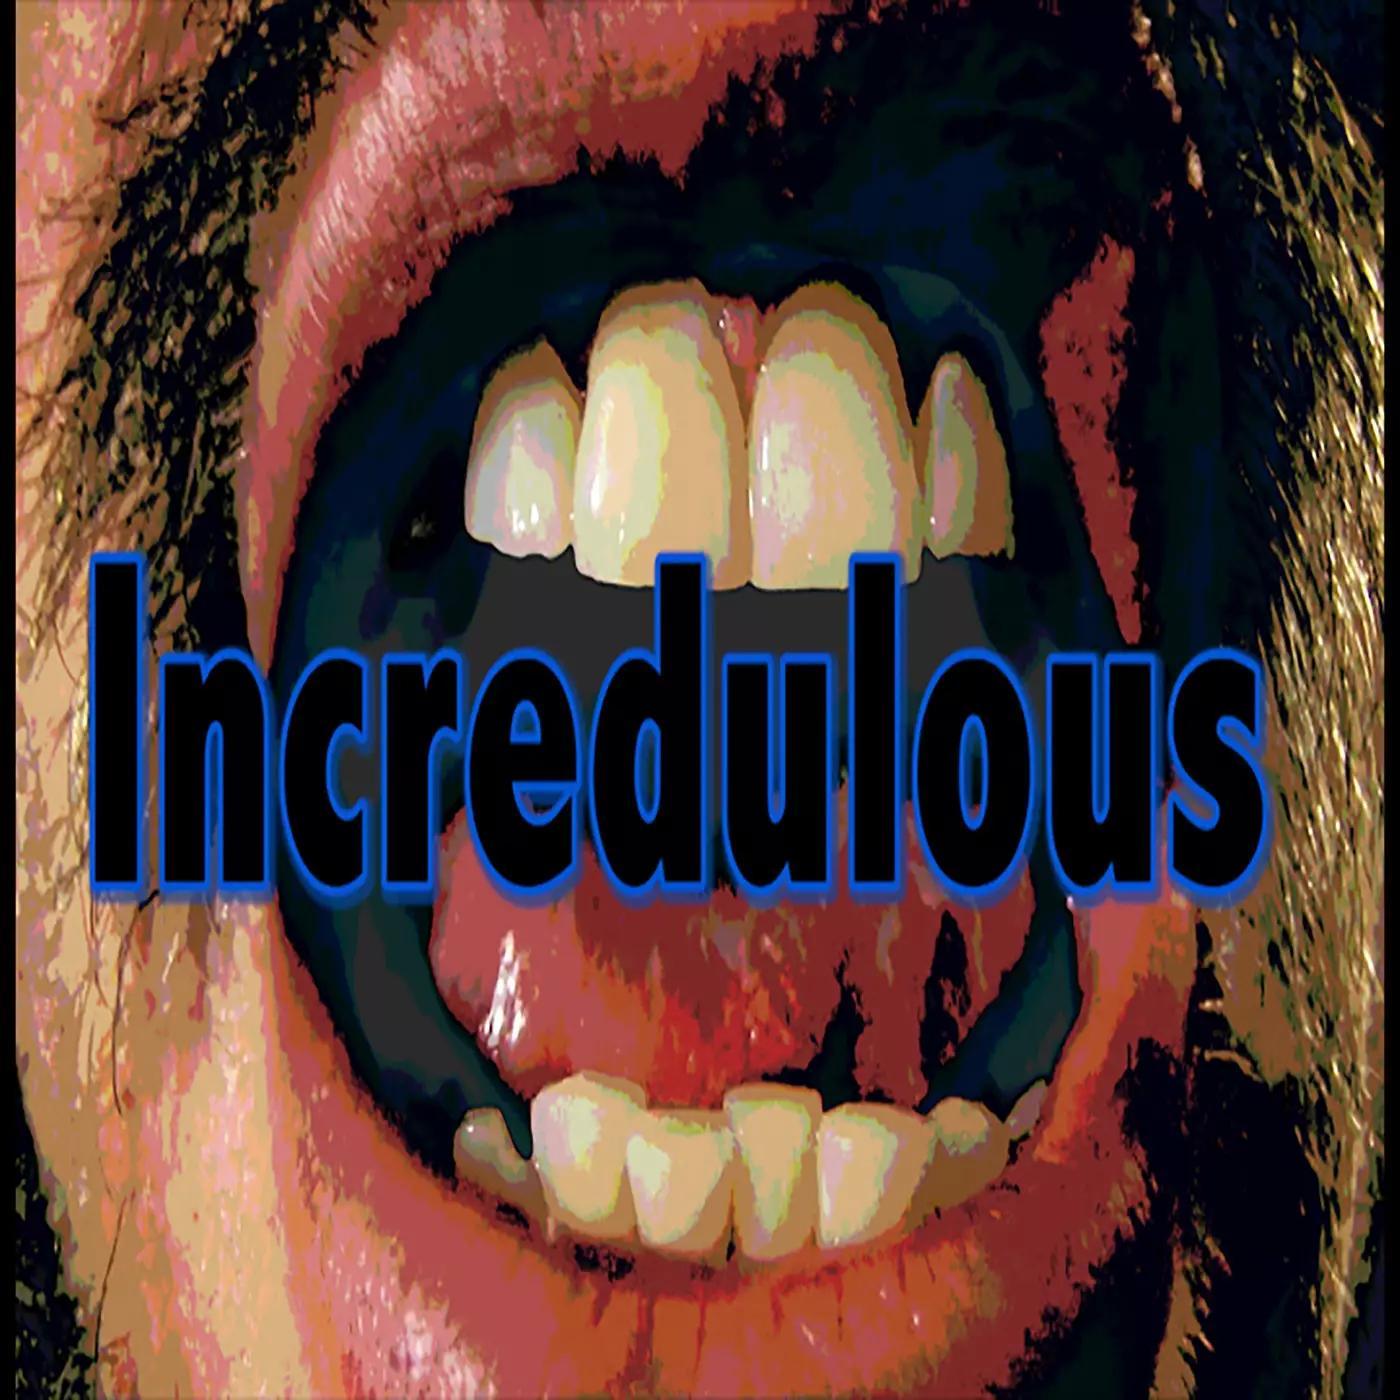 Incredulous-Cover-Image-2